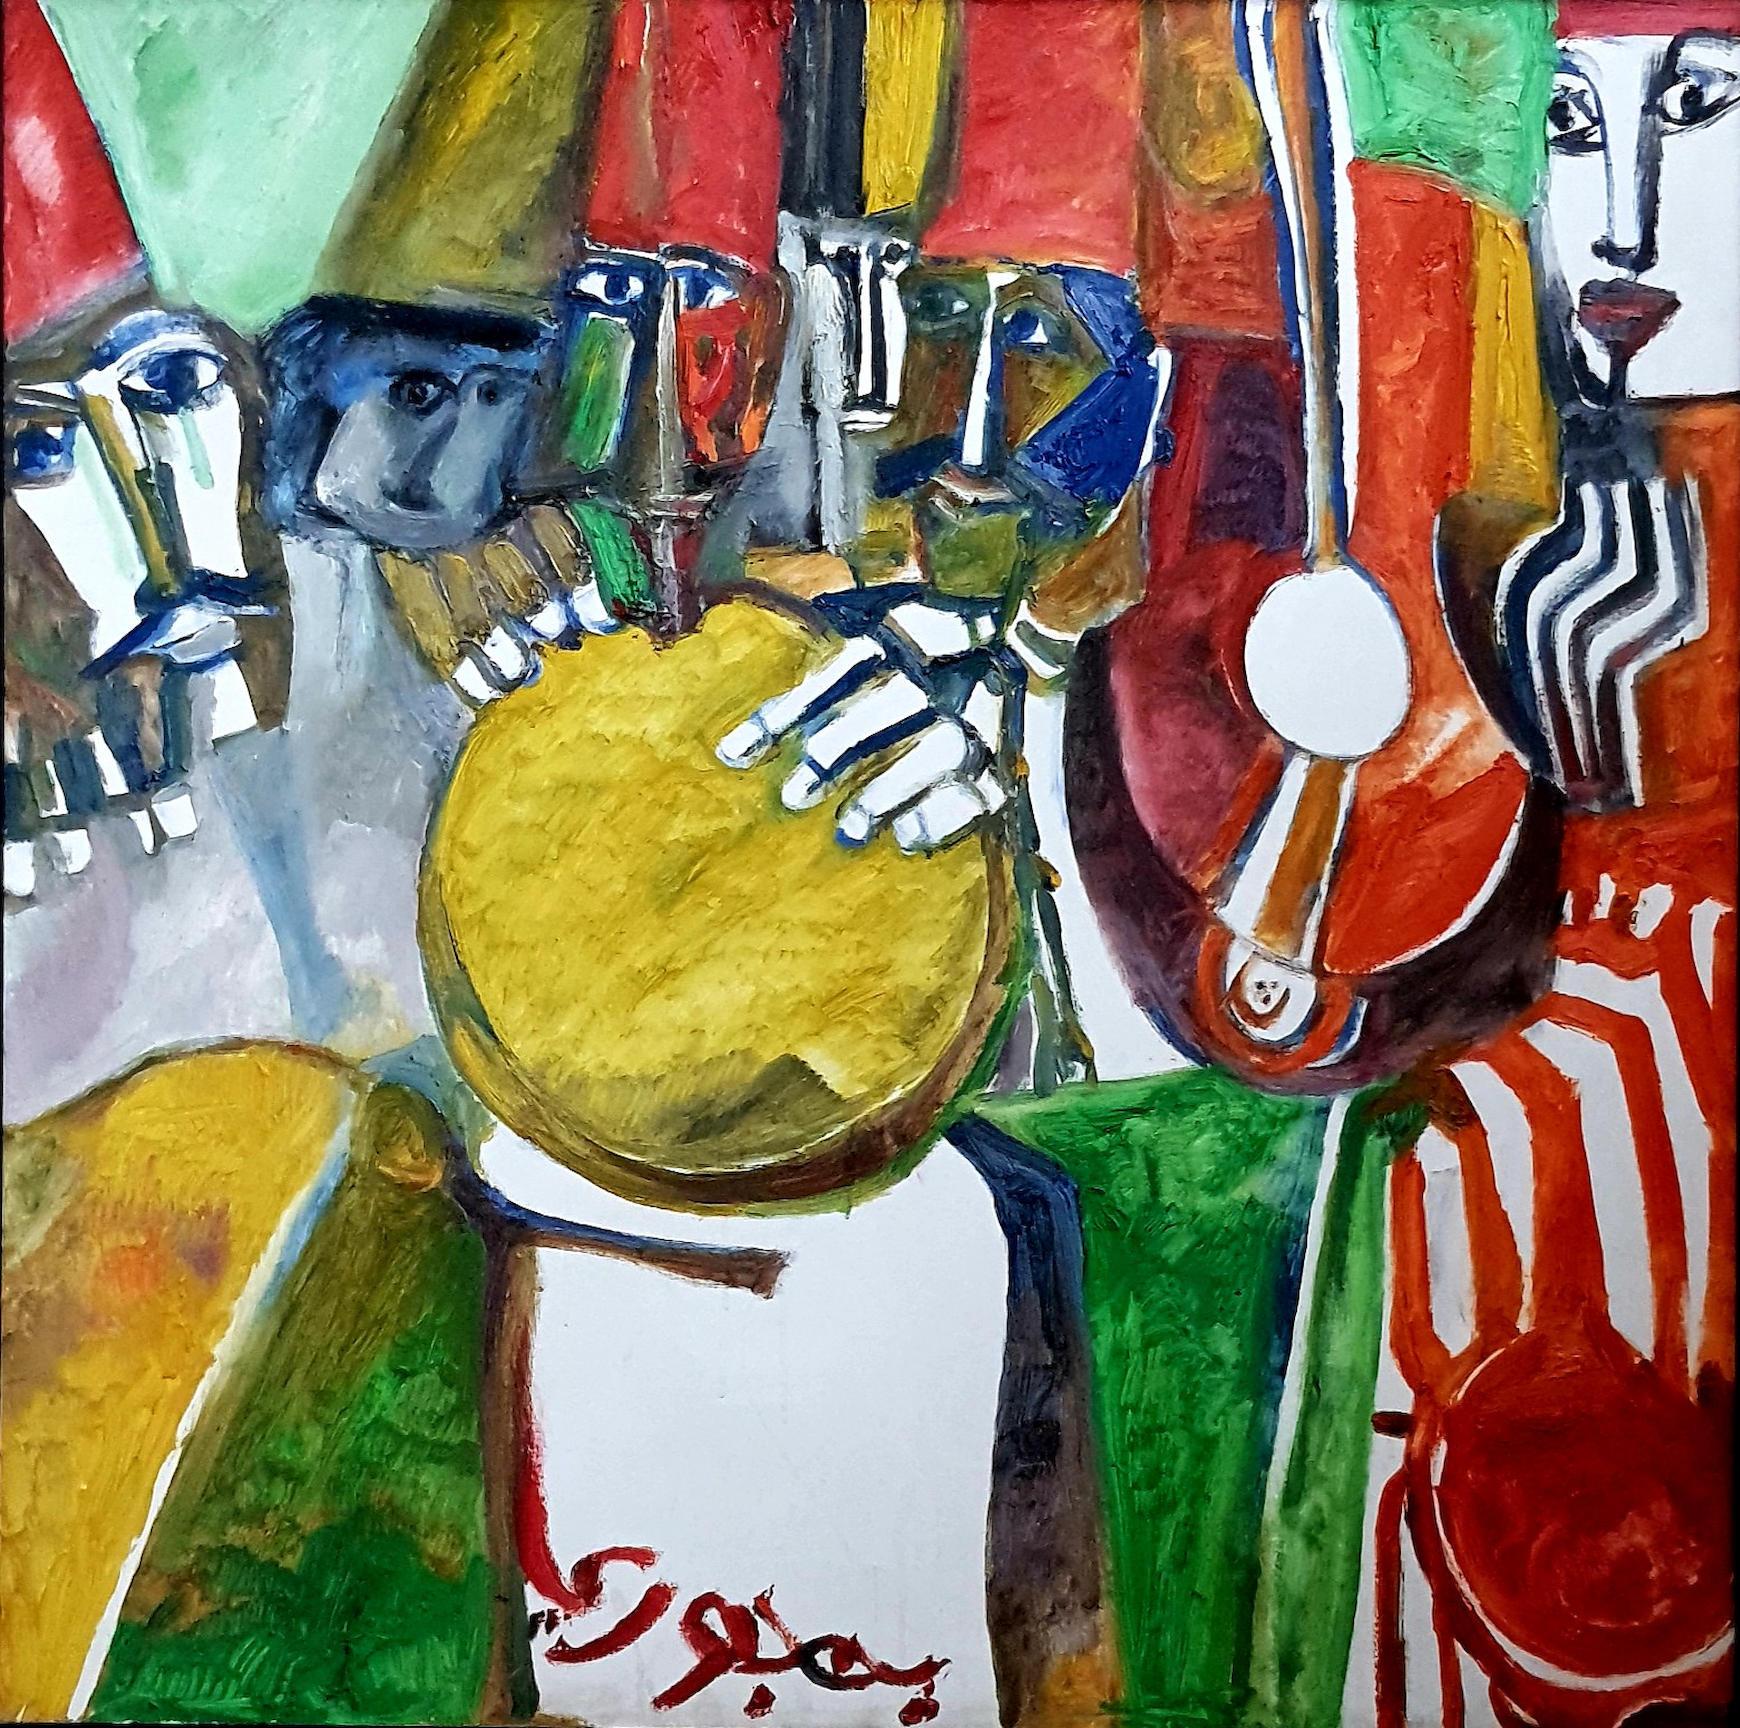 George Bahgoury (Egypt, born 1932) Music Band